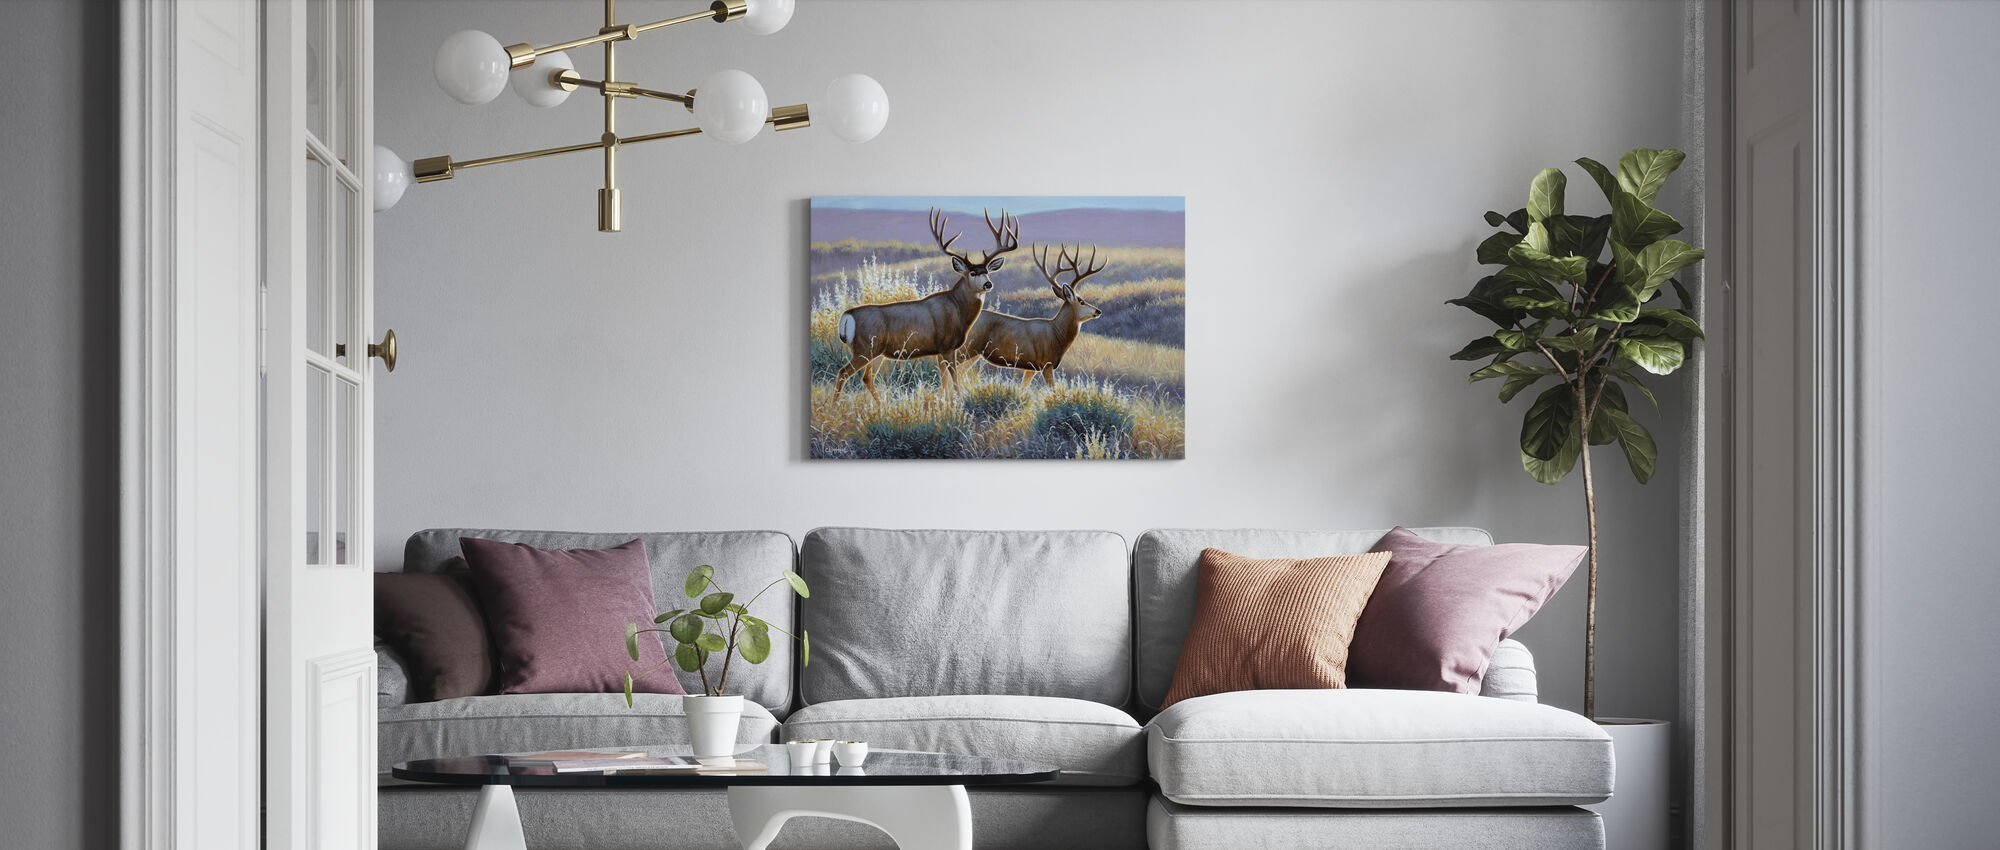 Mulies in Sage - Canvas print - Living Room